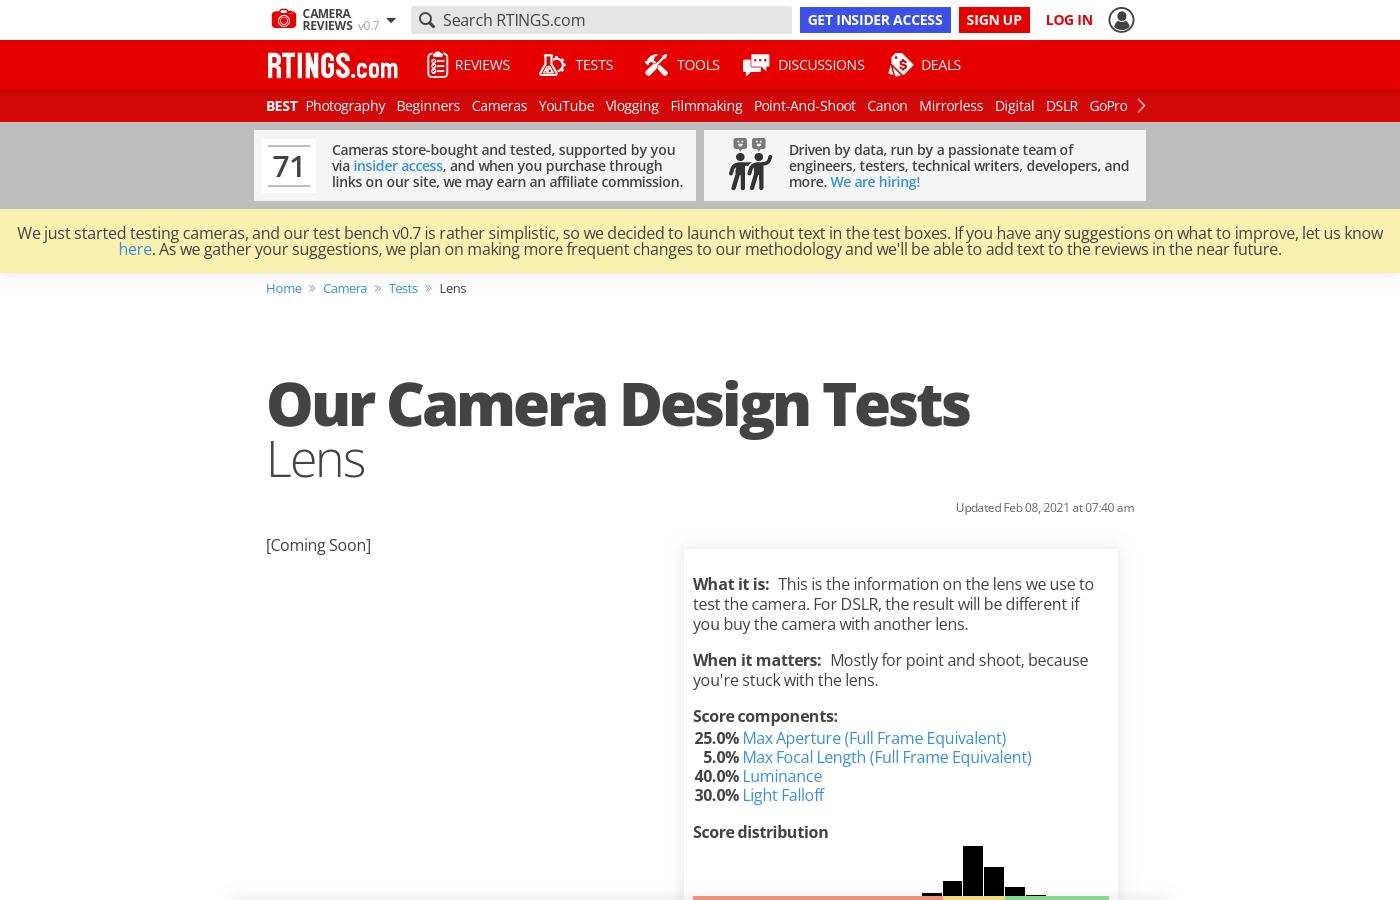 Our Camera Design Tests: Lens